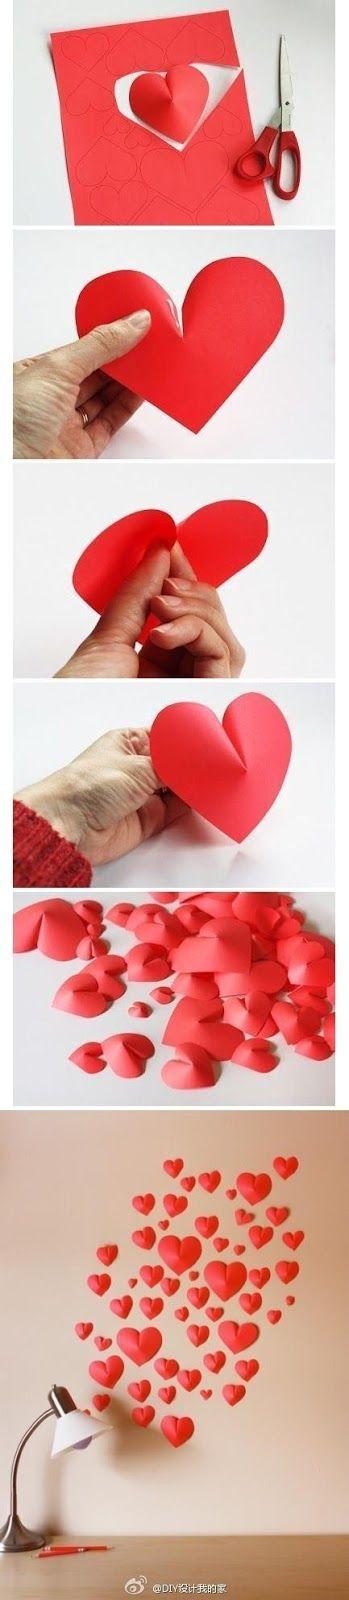 Creative Stuff: Heart craft: paper, scissors and a touch of glue